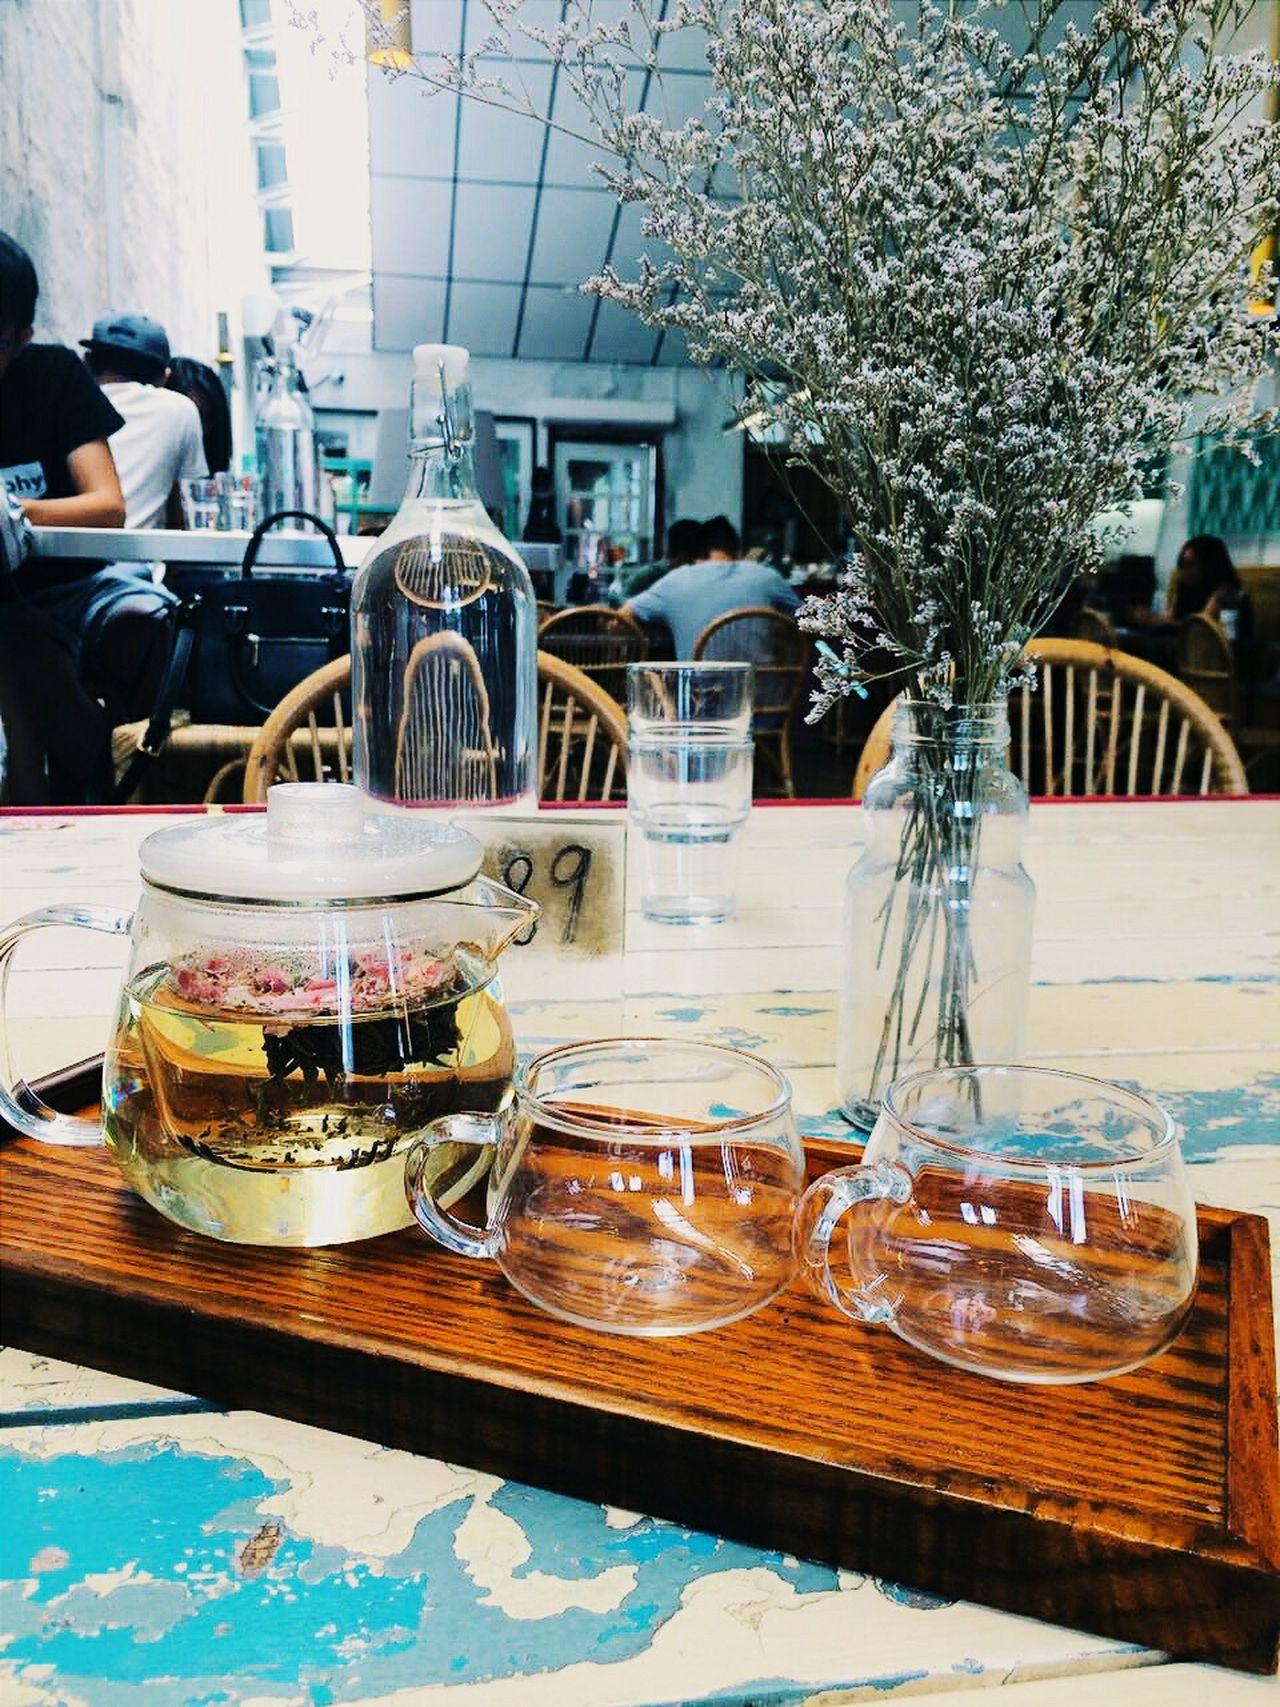 Hand Crafted Tea Rose Tea Tea Set Brunch Merchant's Lane Cafe Hopping Petaling Street Kuala Lumpur Malaysia